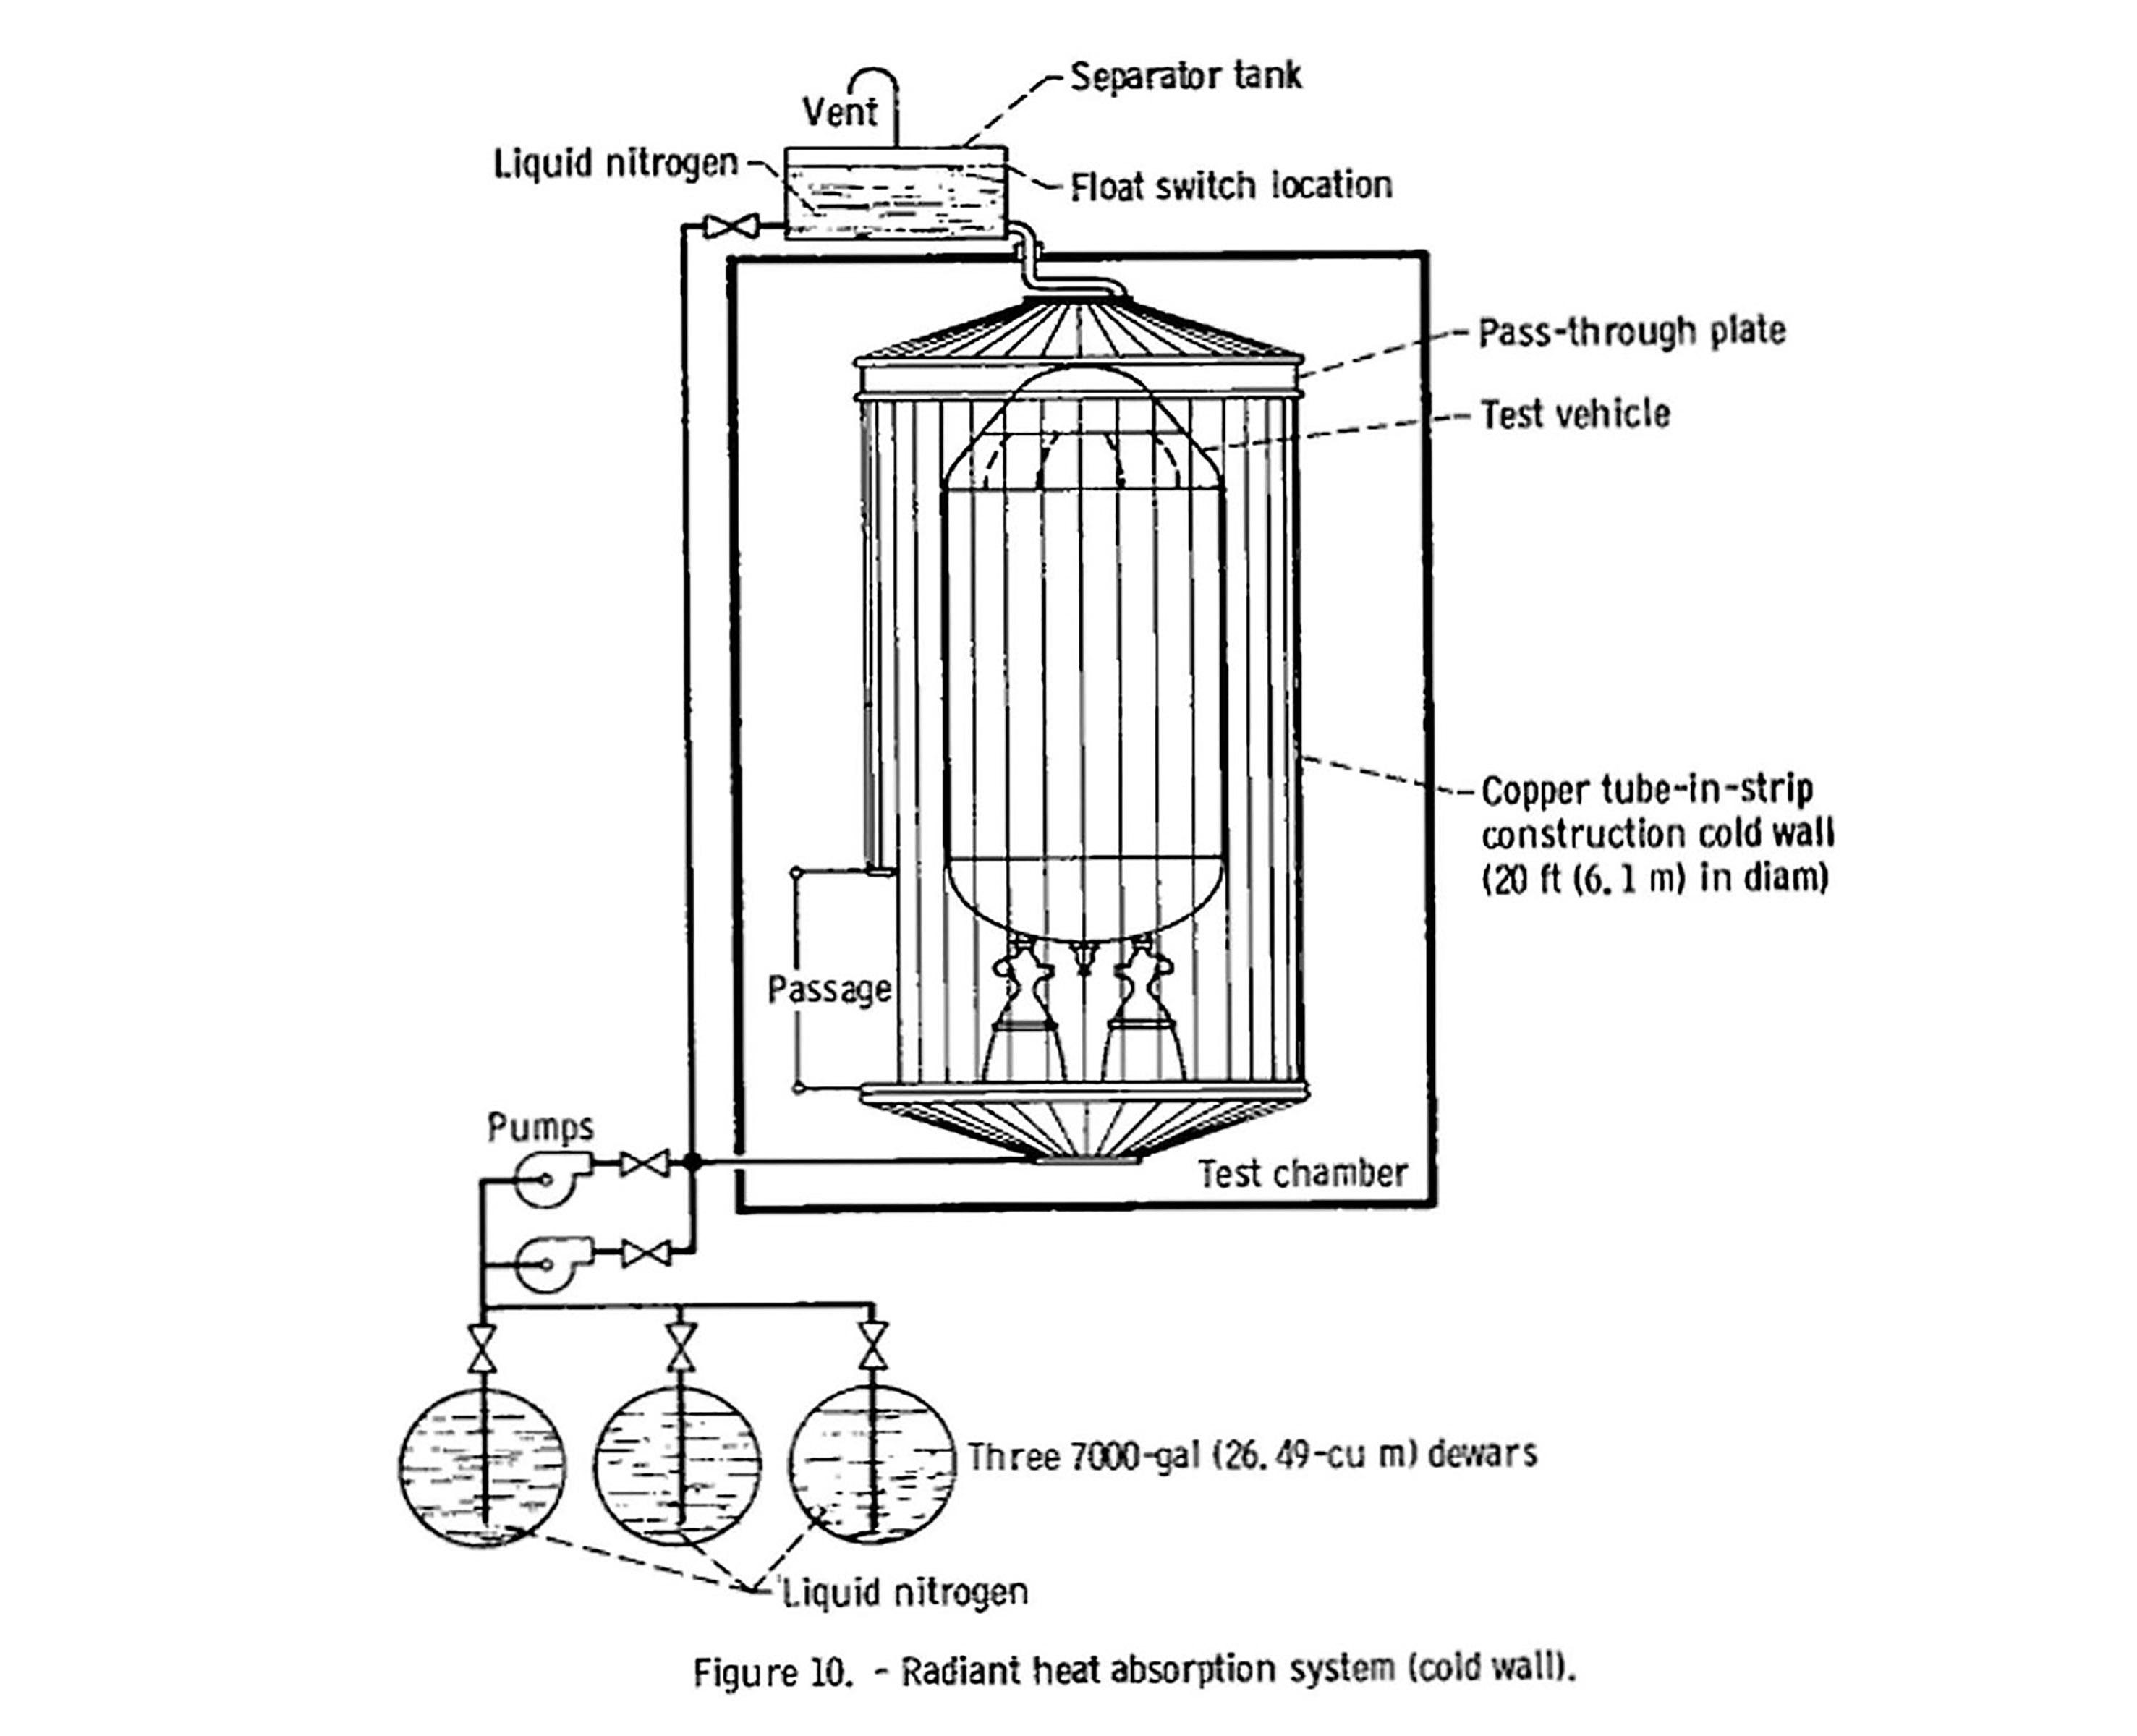 Spc Facility Description